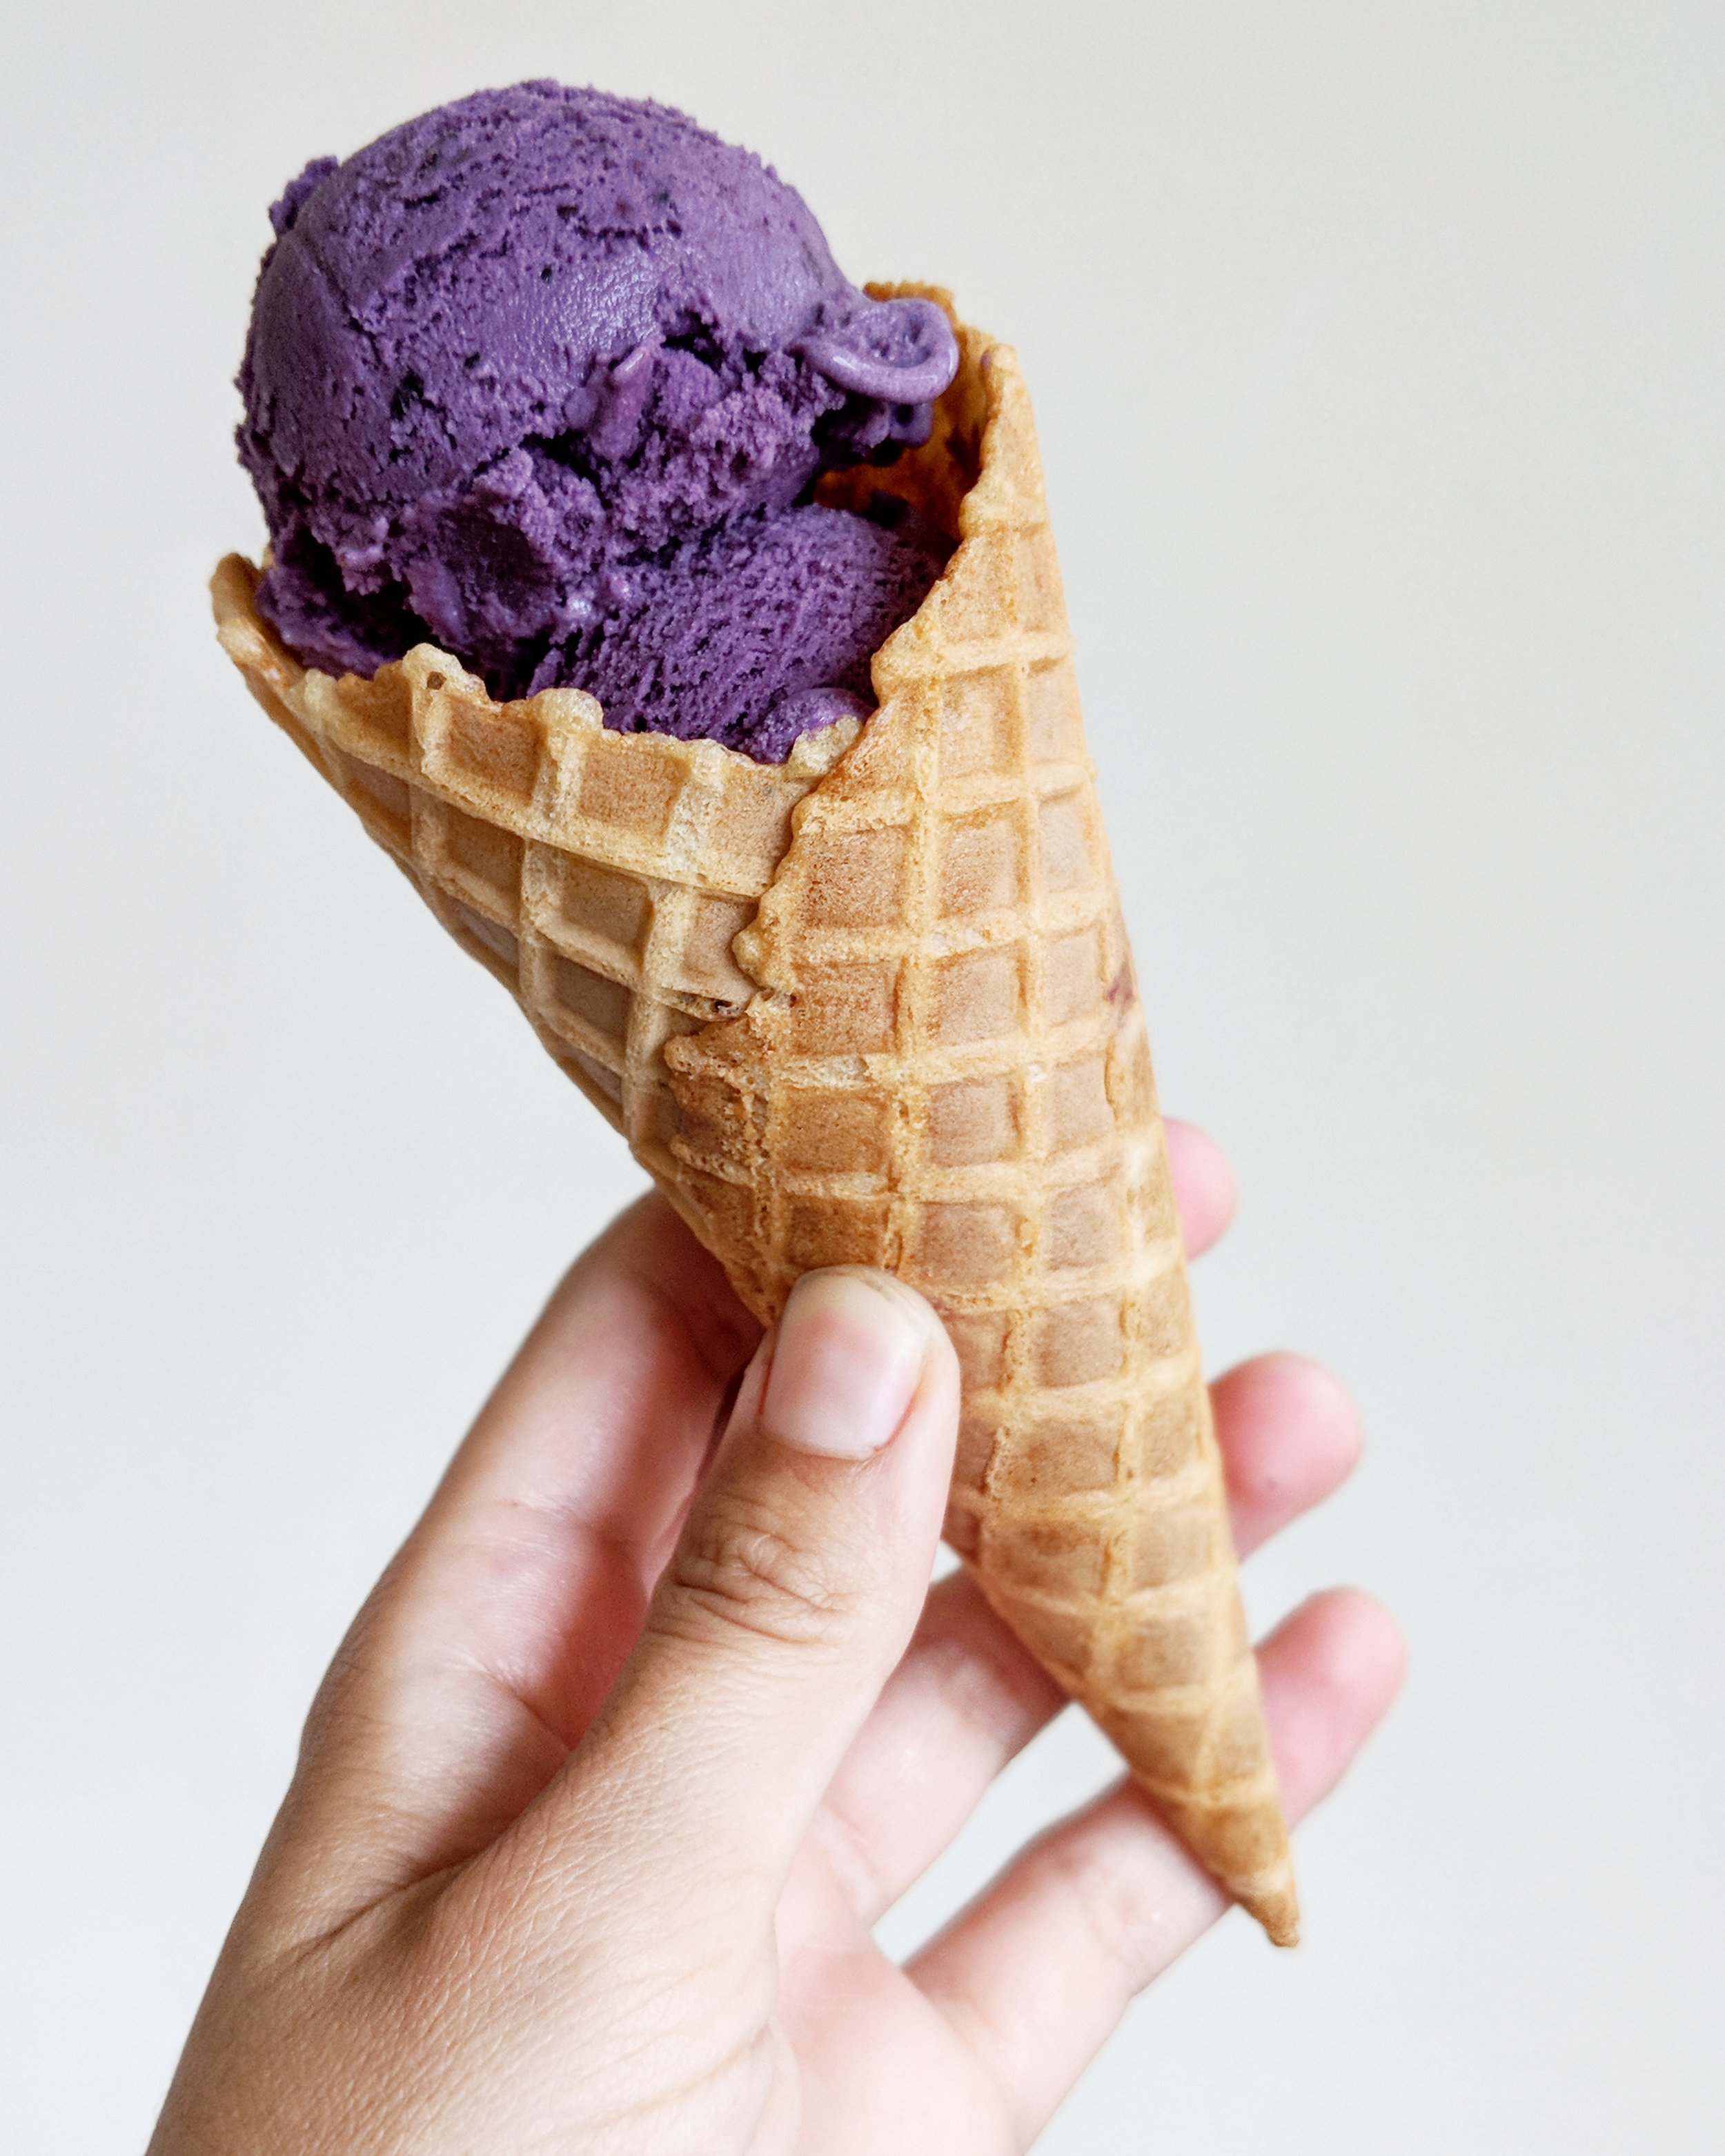 blueberryicecream.jpg